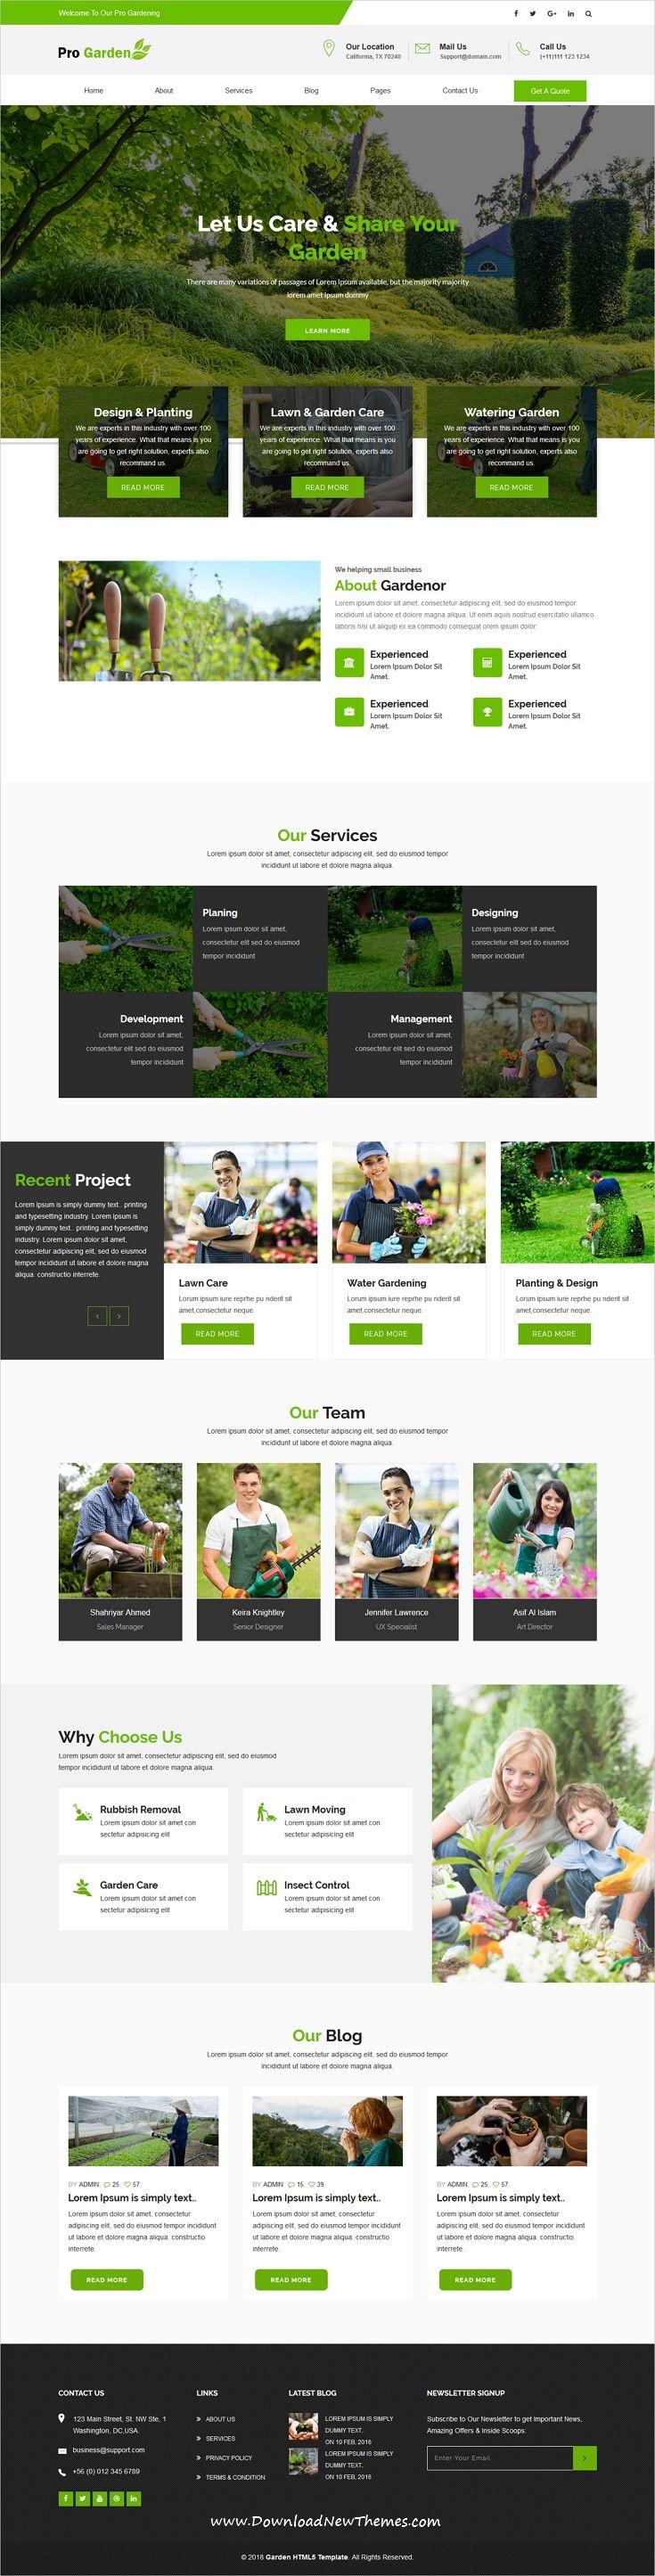 Progadan Gardening Landscaping Html Template Landscape Design Landscape Layout Design Inspiration